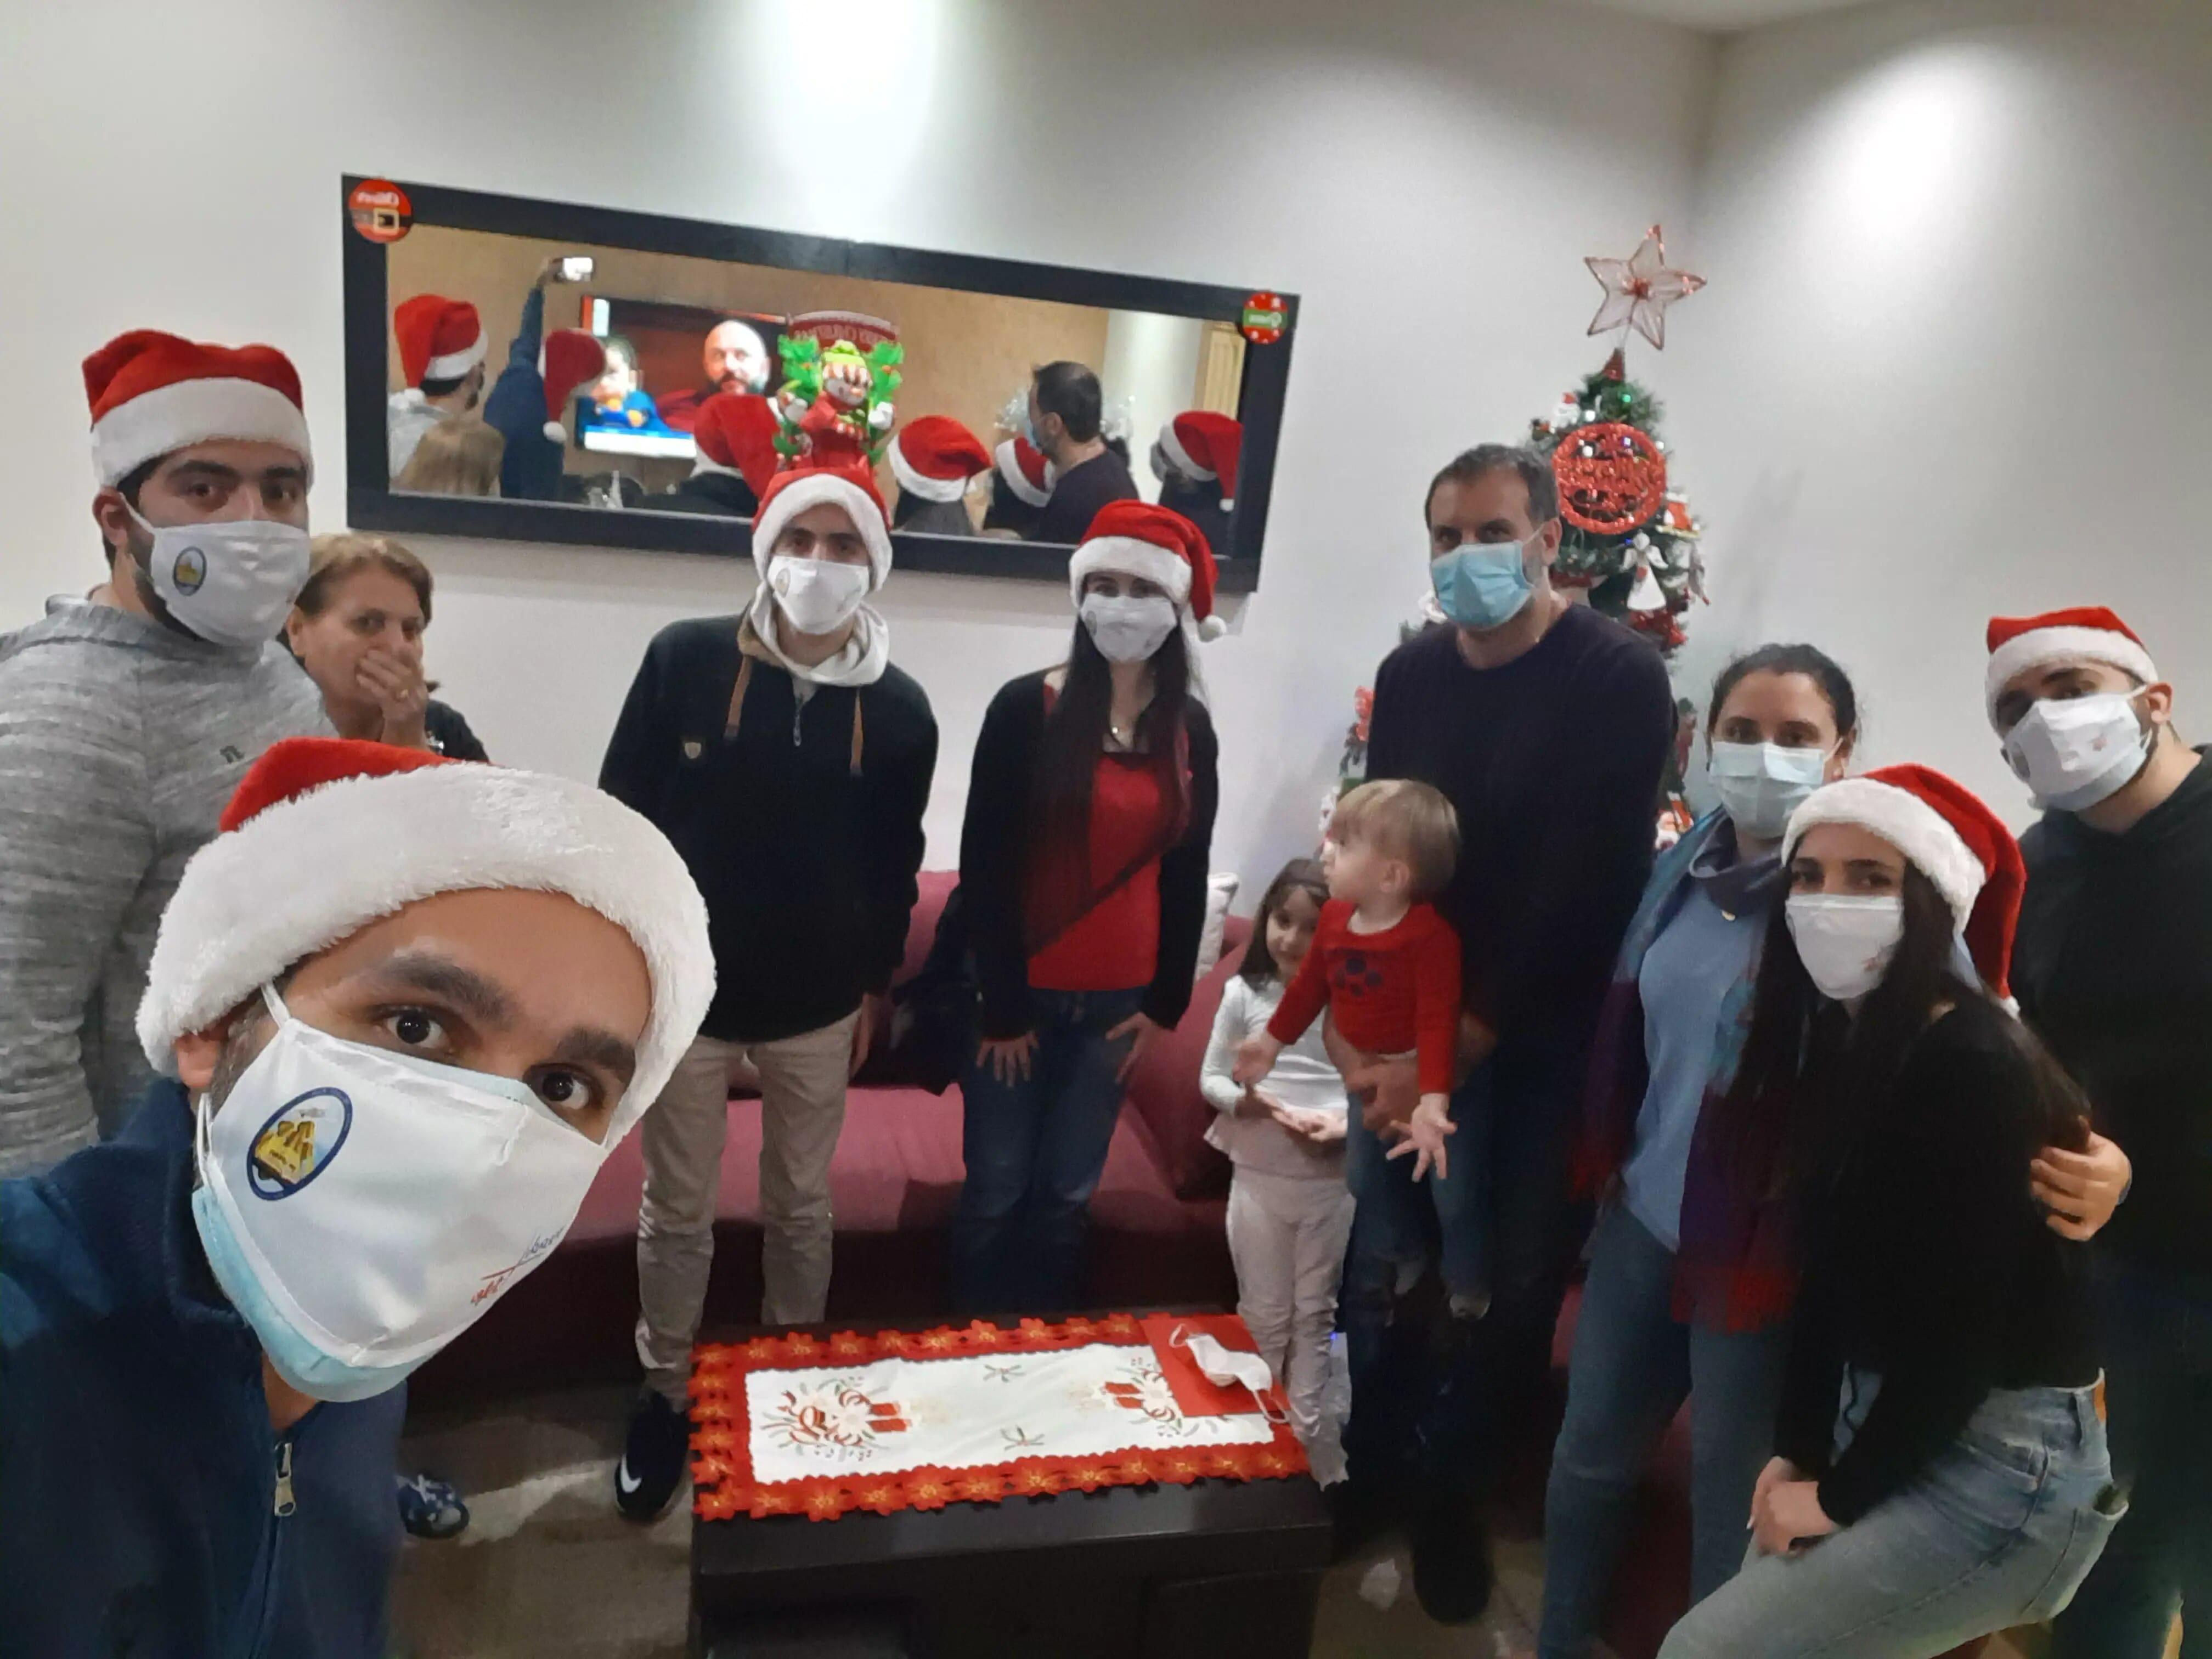 https://eundemia.sirv.com/Images/christmas/456834.webp